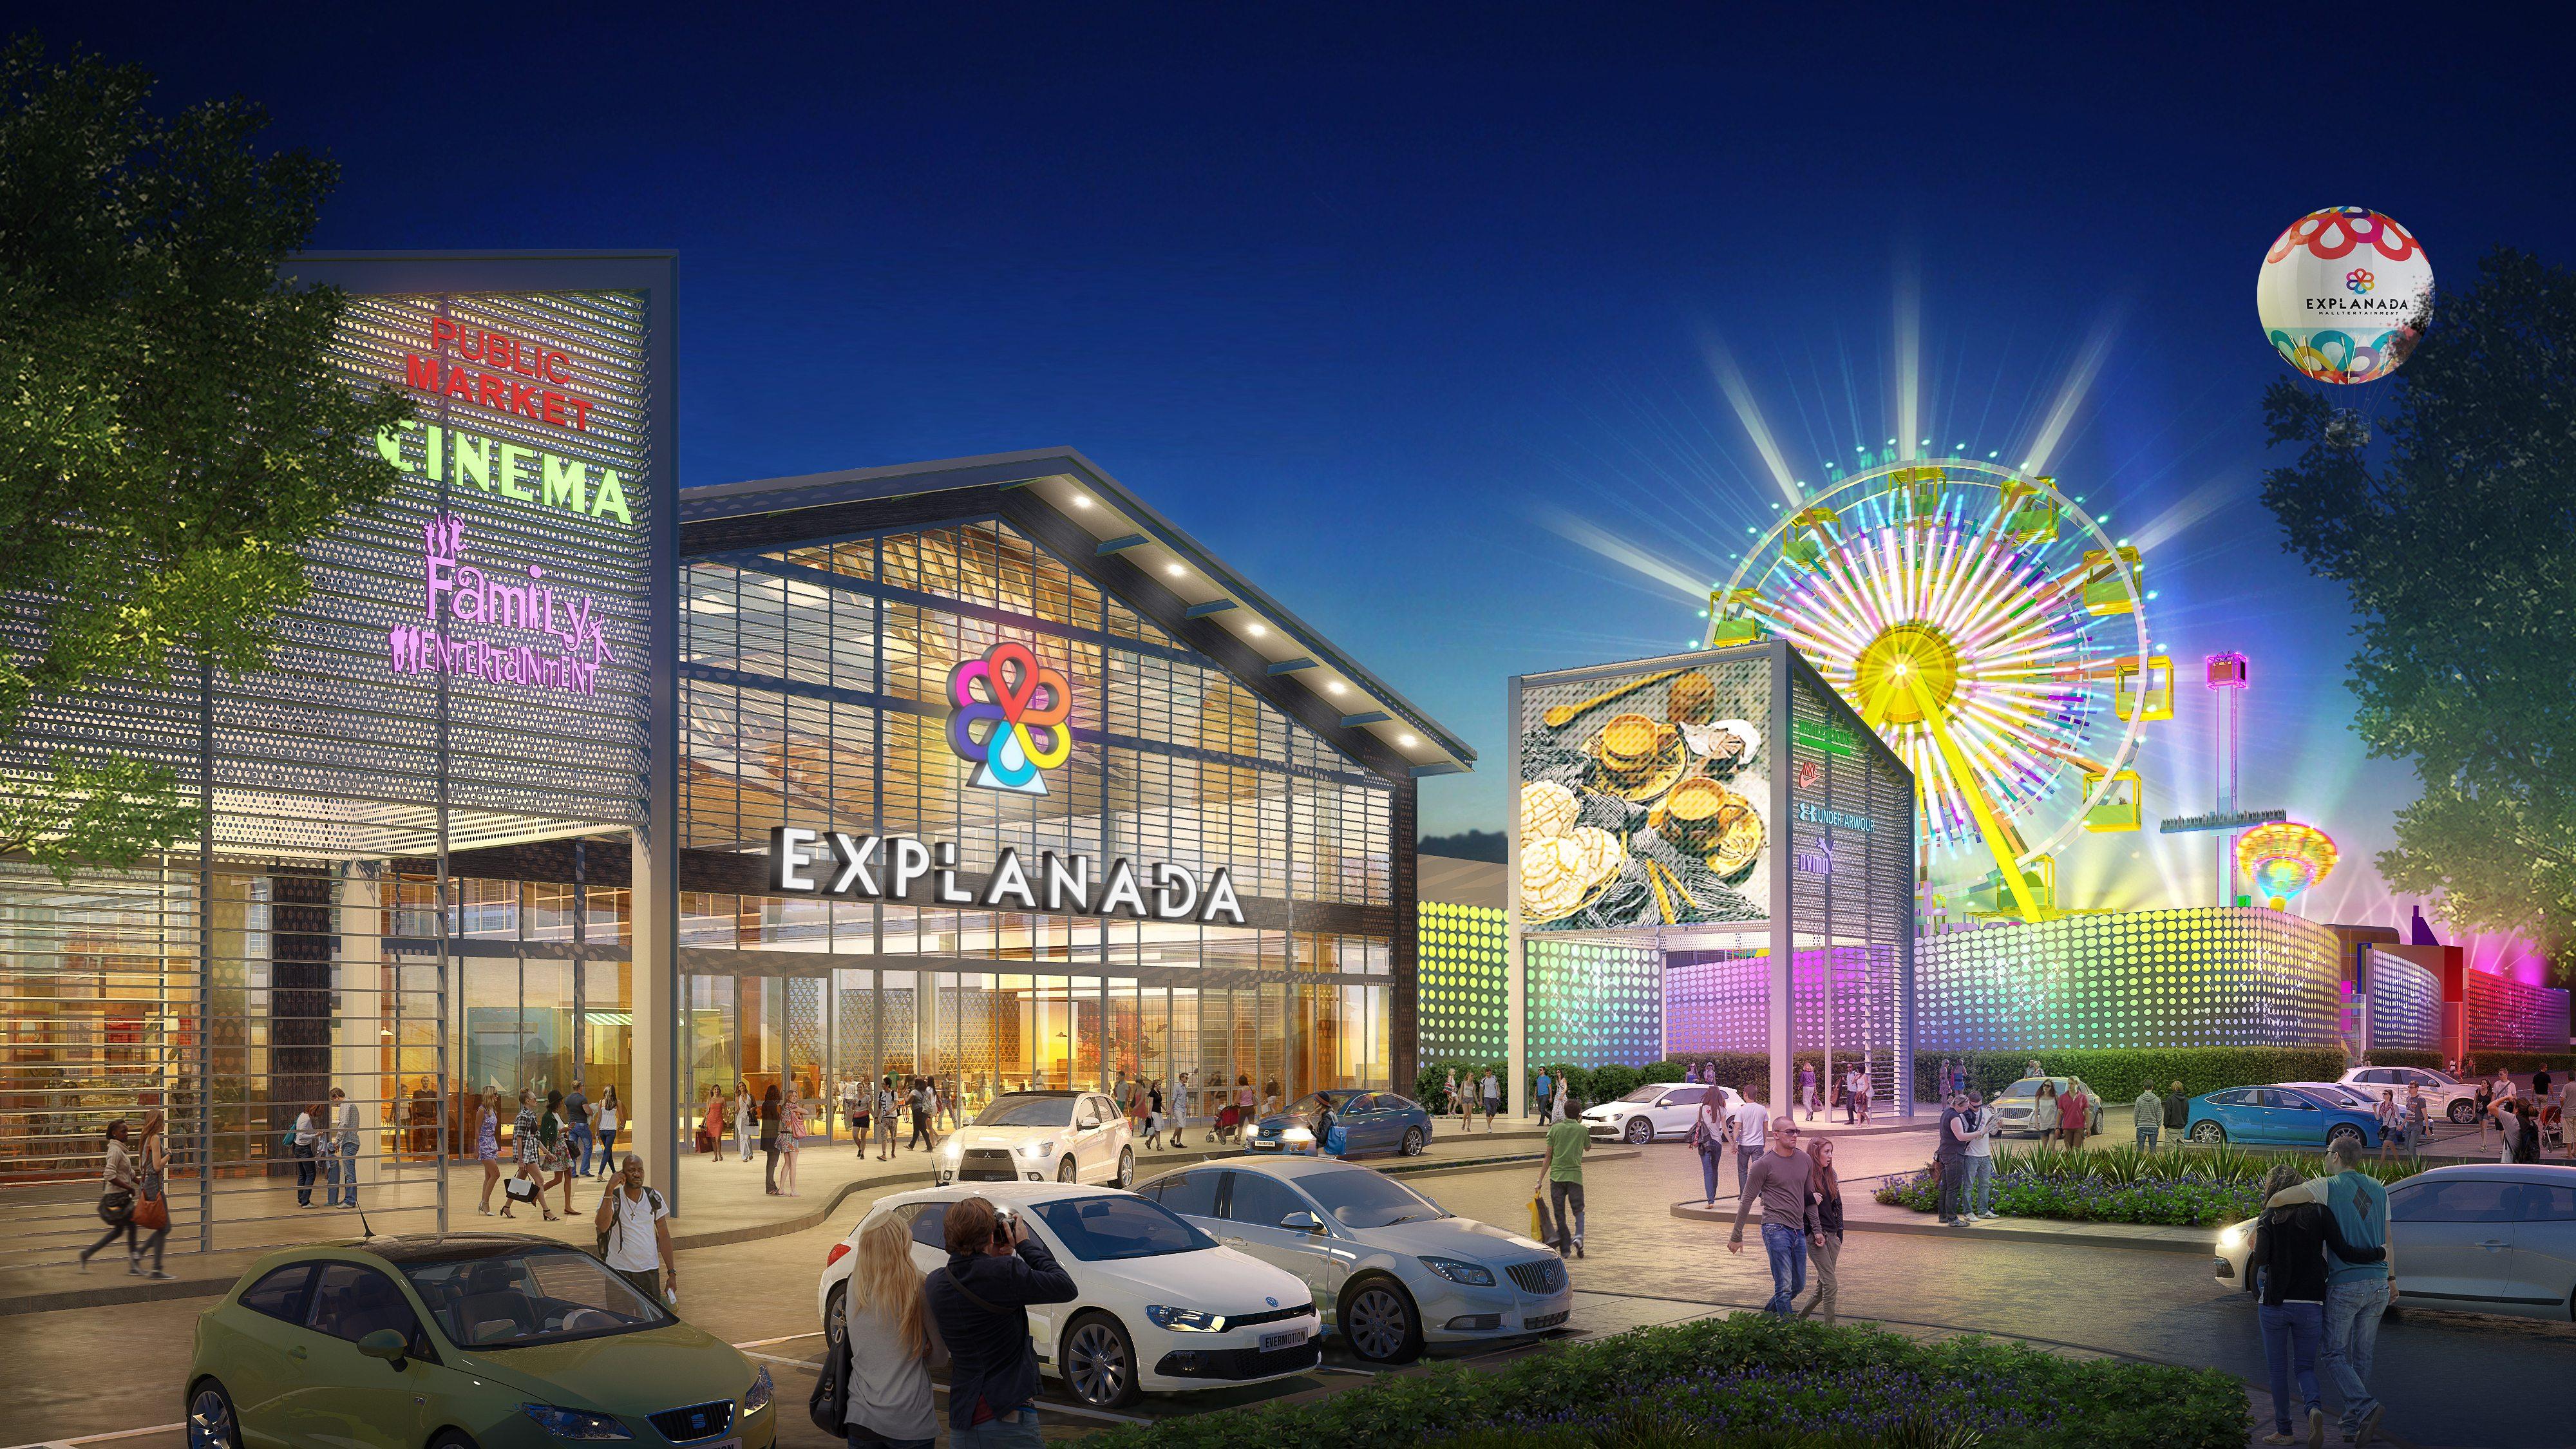 Gicsa abrirá 10 'mega malls' en México; invertirá 20,000 mdp